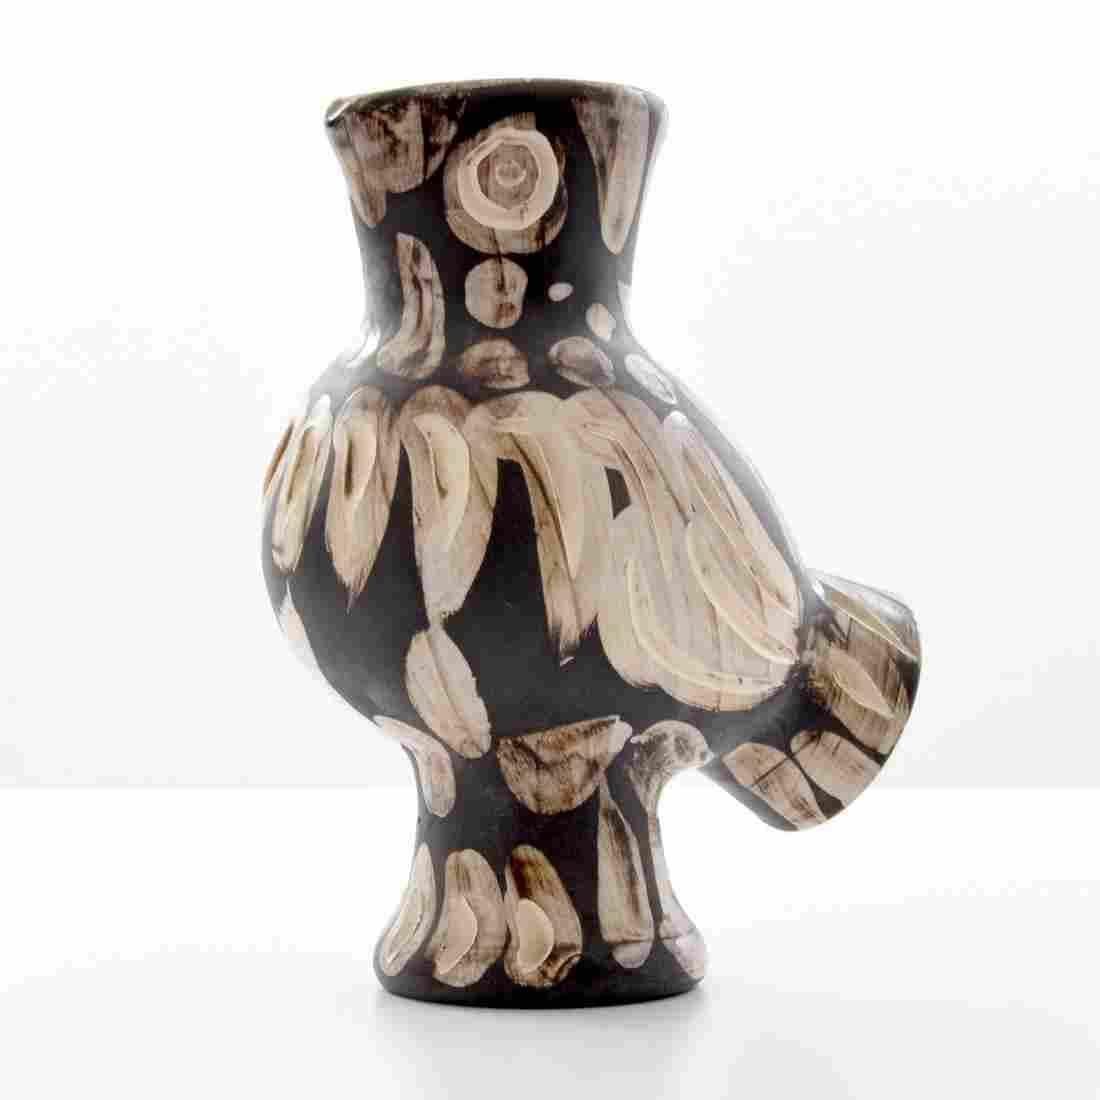 Pablo Picasso CHOUETTE Vase/Vessel (A.R. 605)